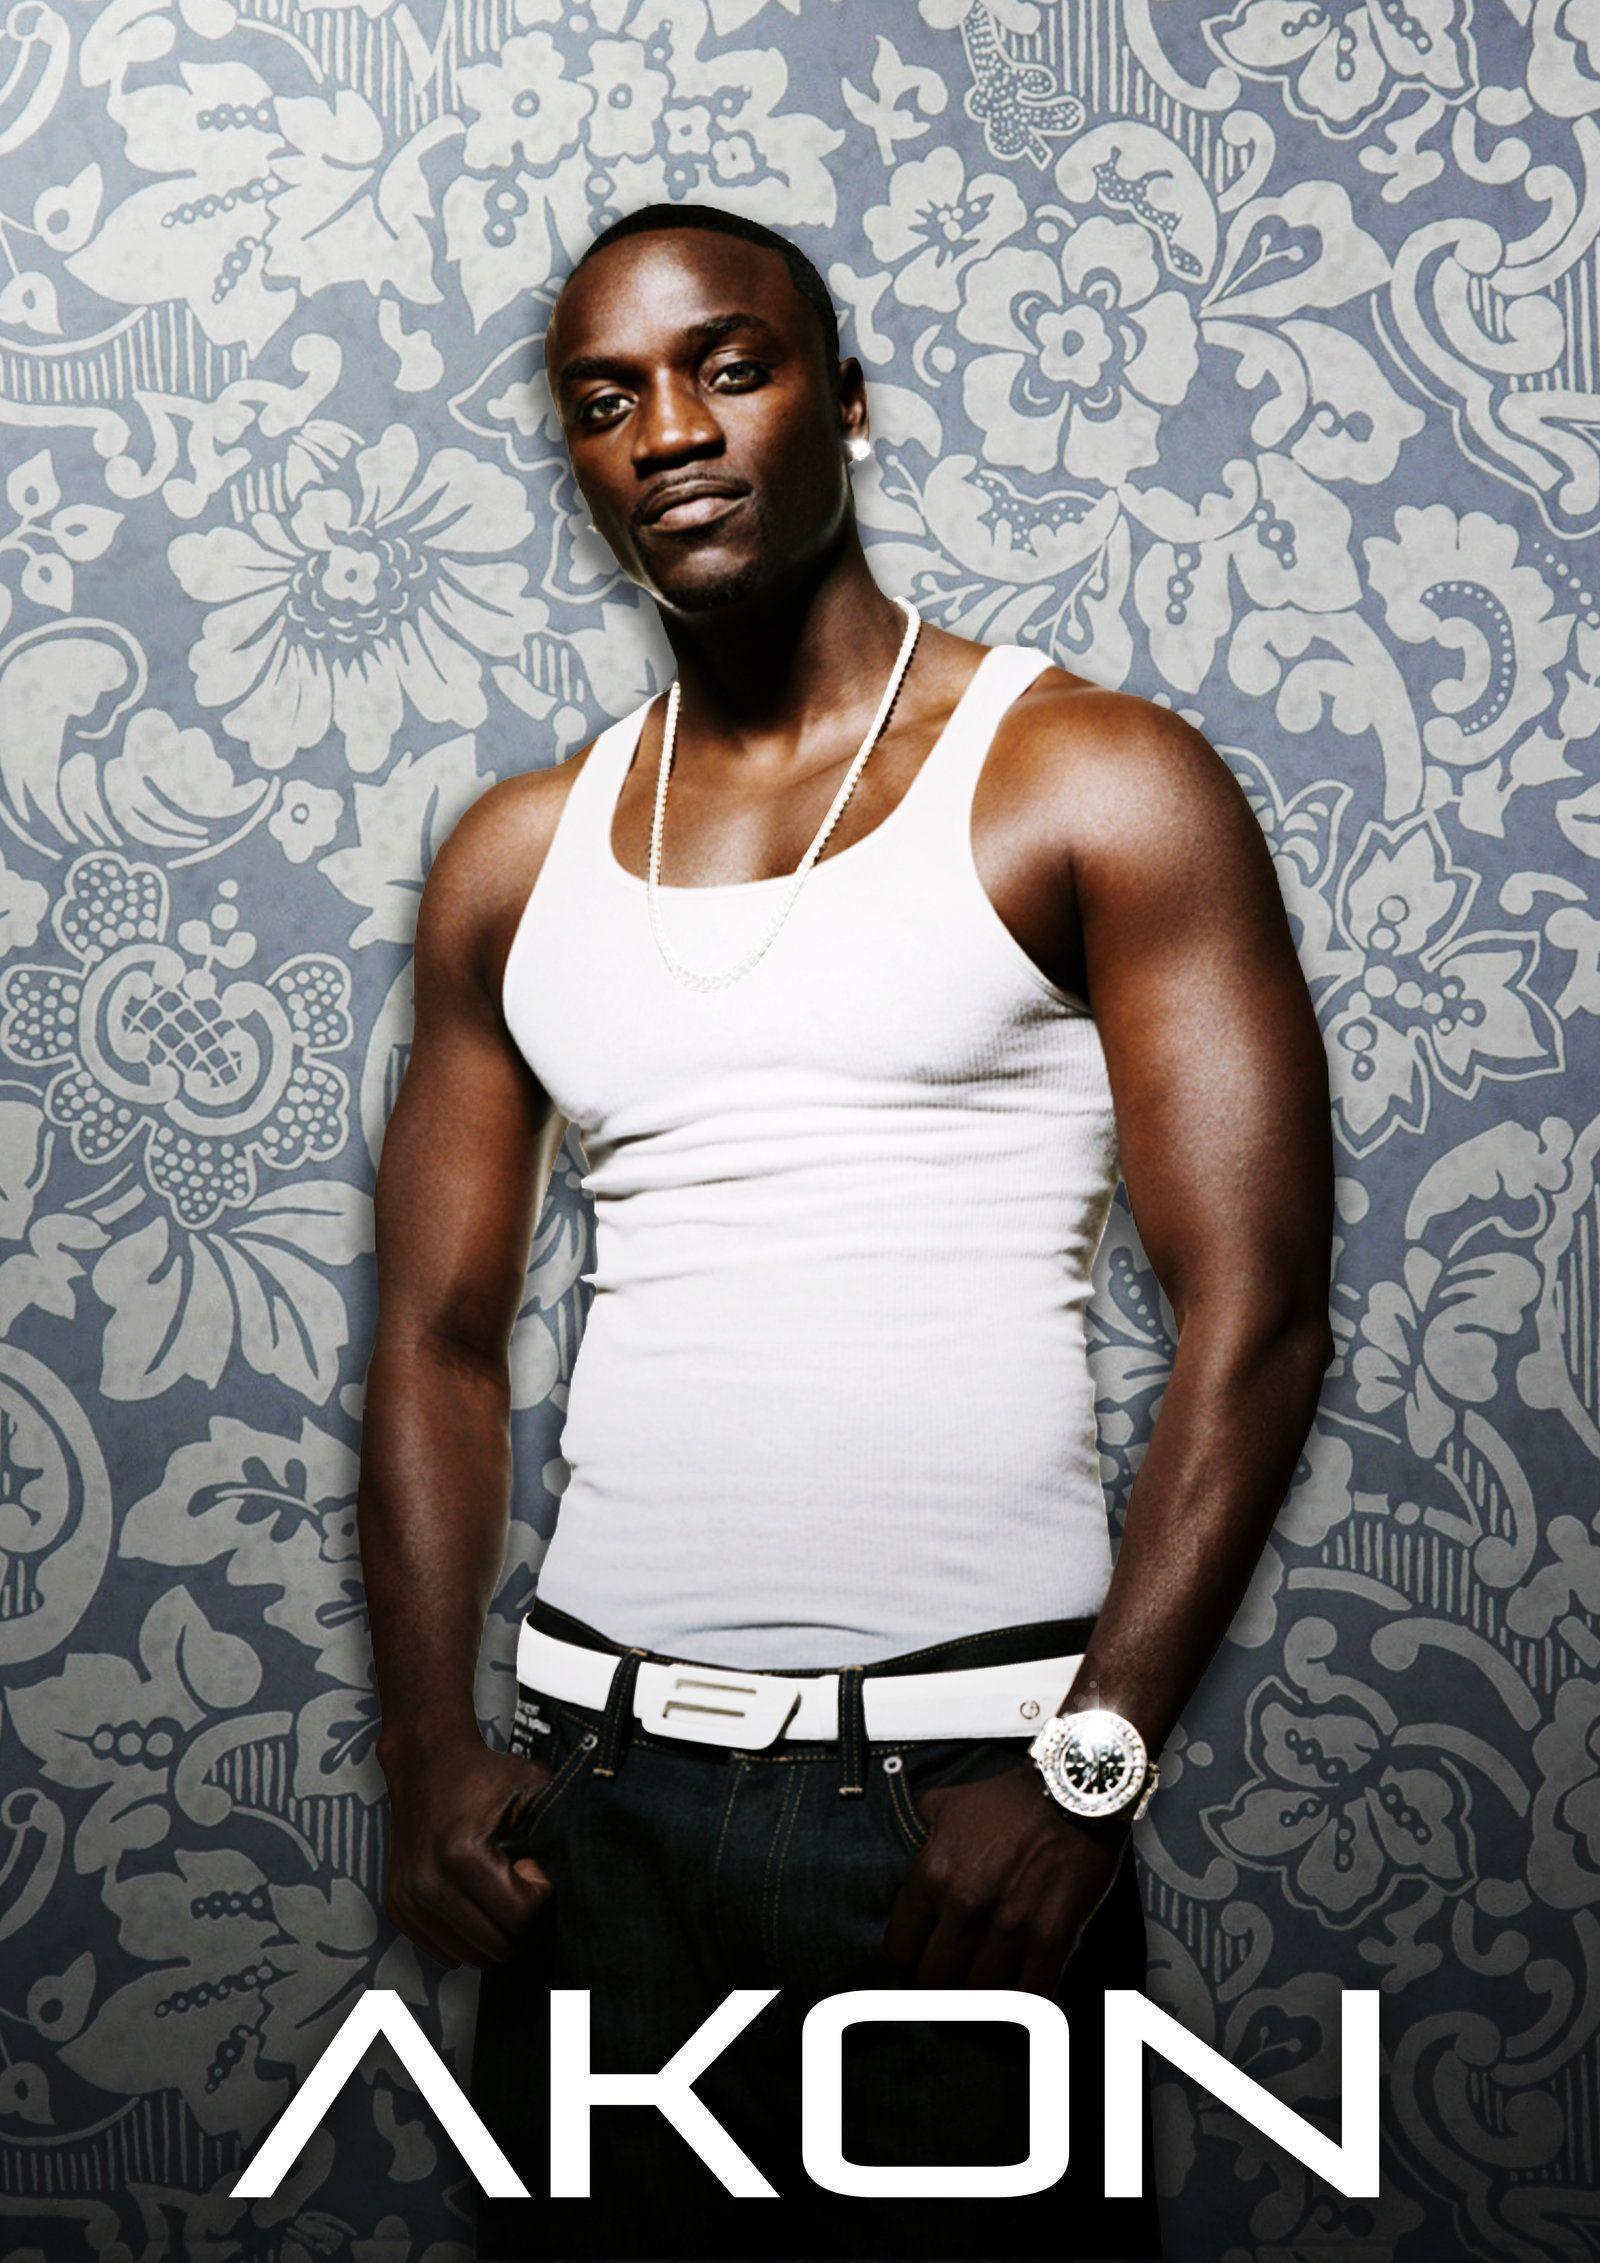 Gangsta Wallpaper Hd Akon Wallpapers Wallpaper Cave